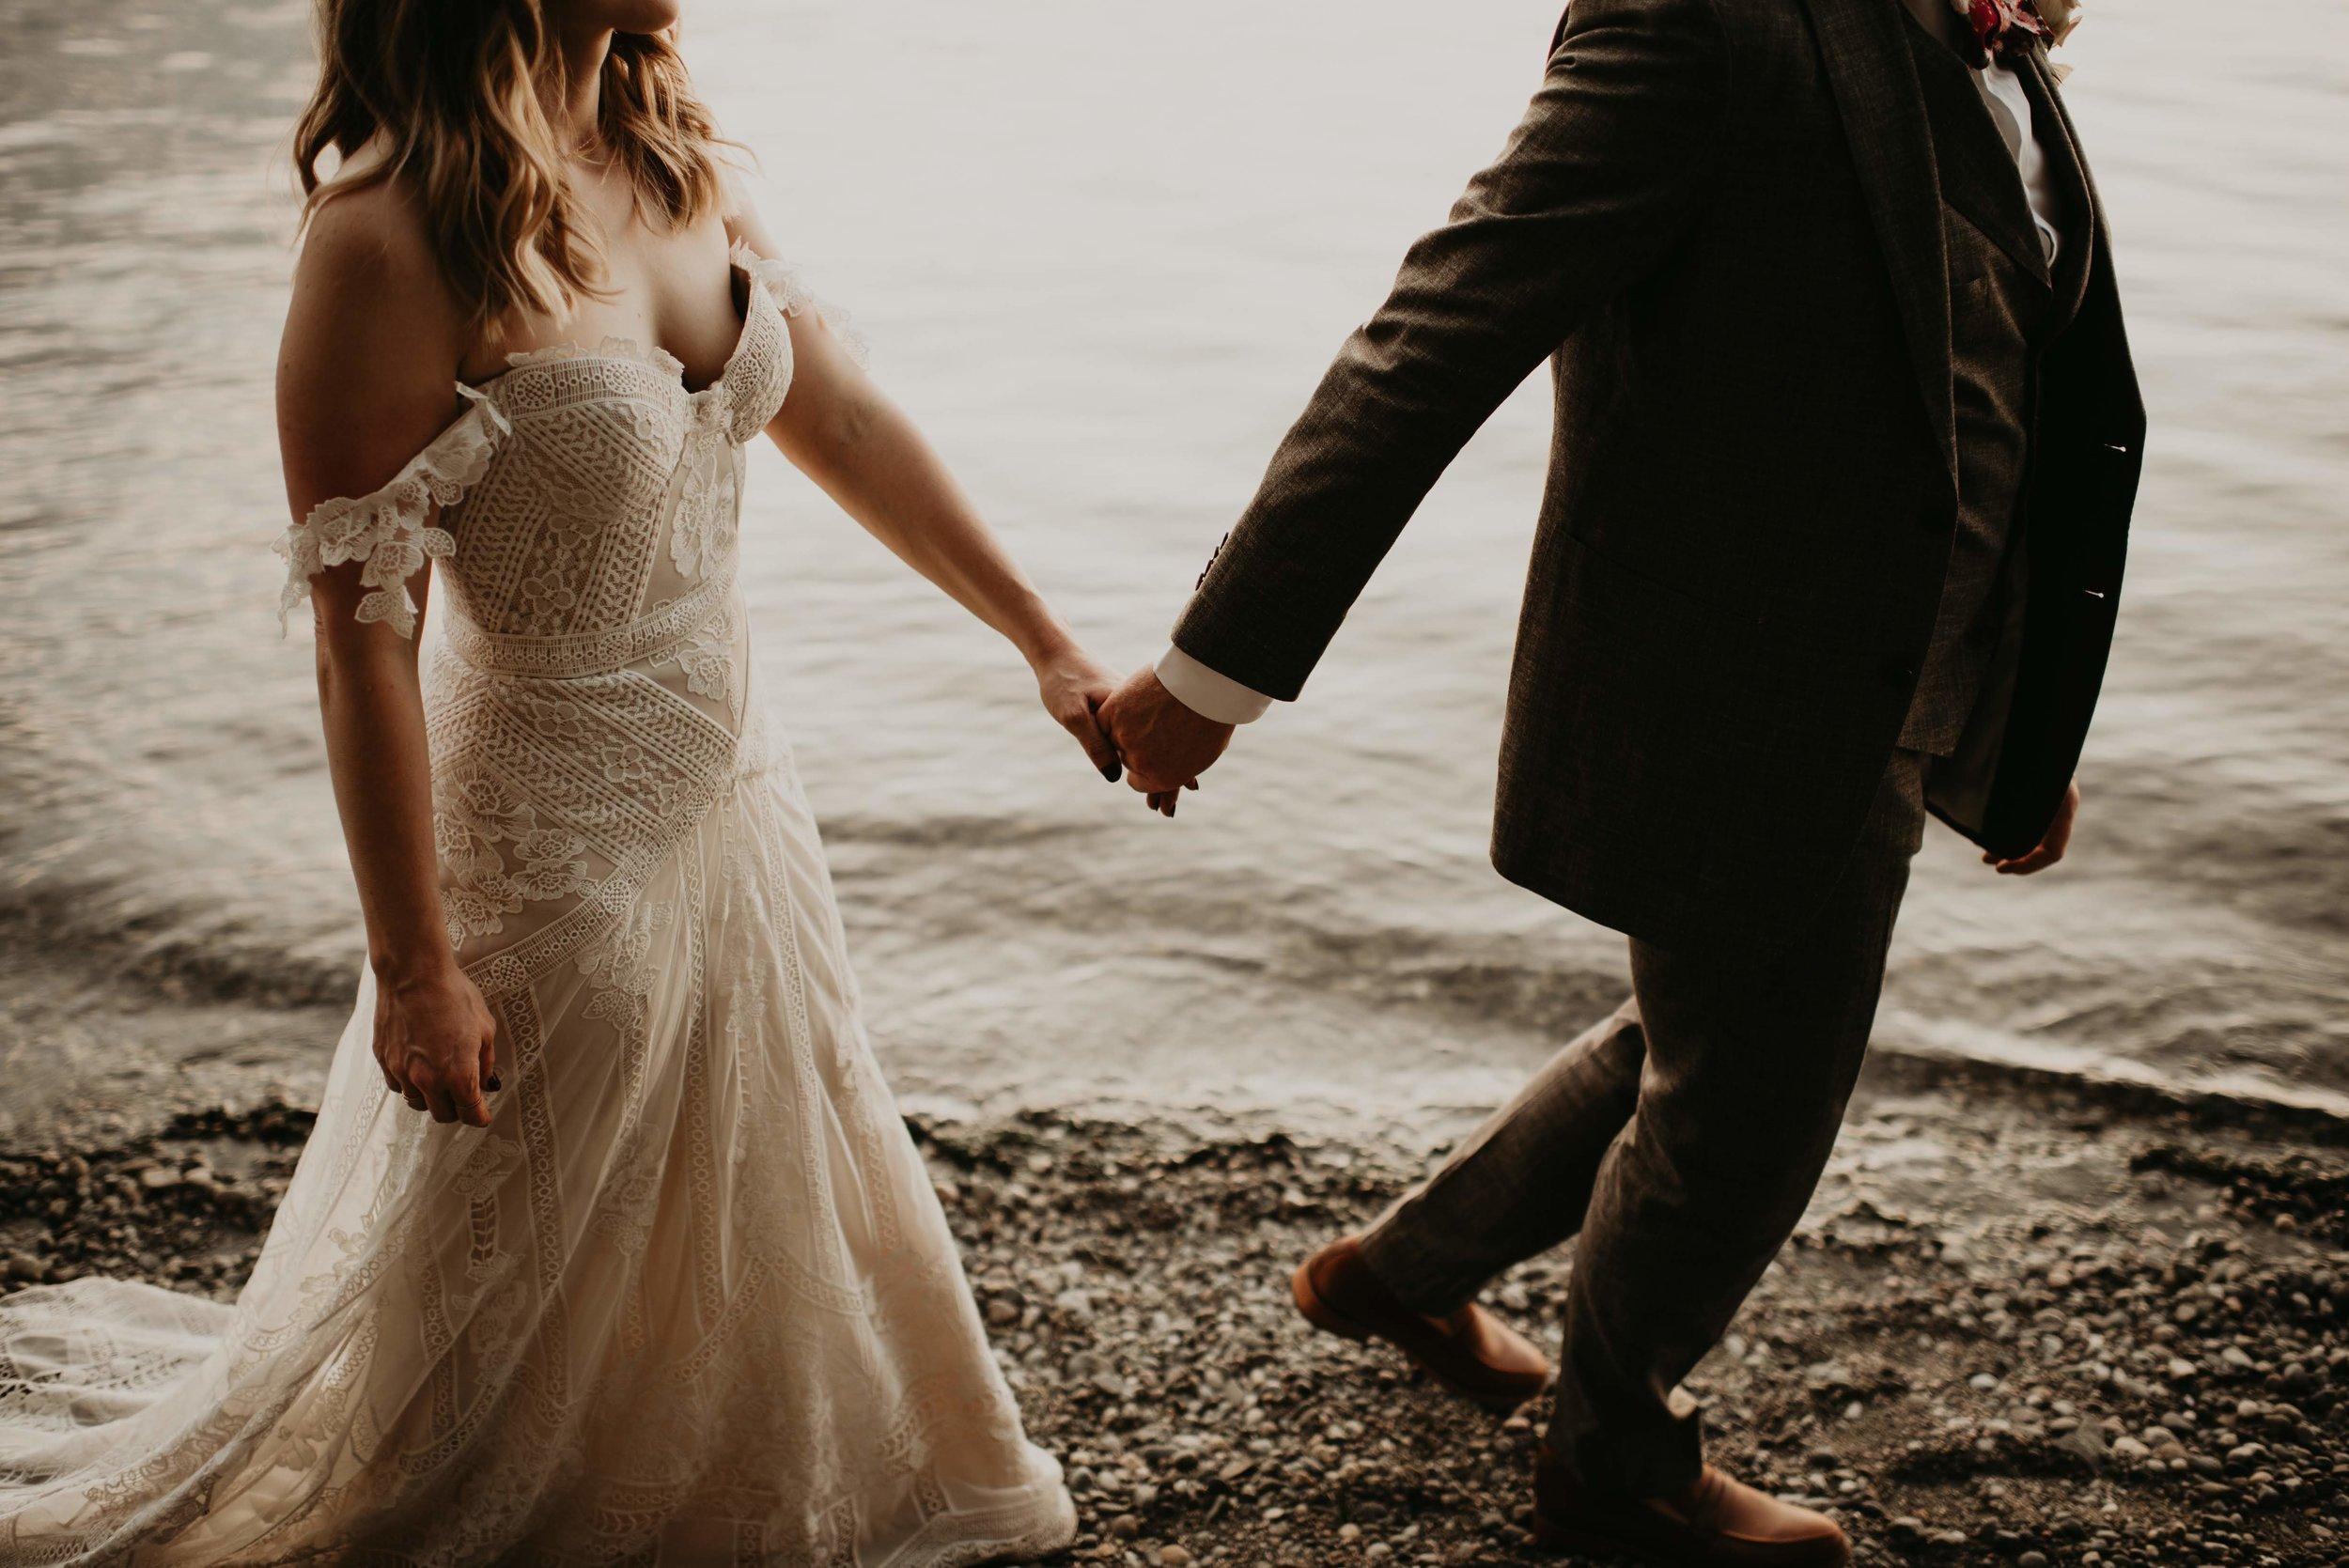 Ashley + Peter Wedding - Kitsap Memorial State Park - Kamra Fuller Photography-1019.jpg